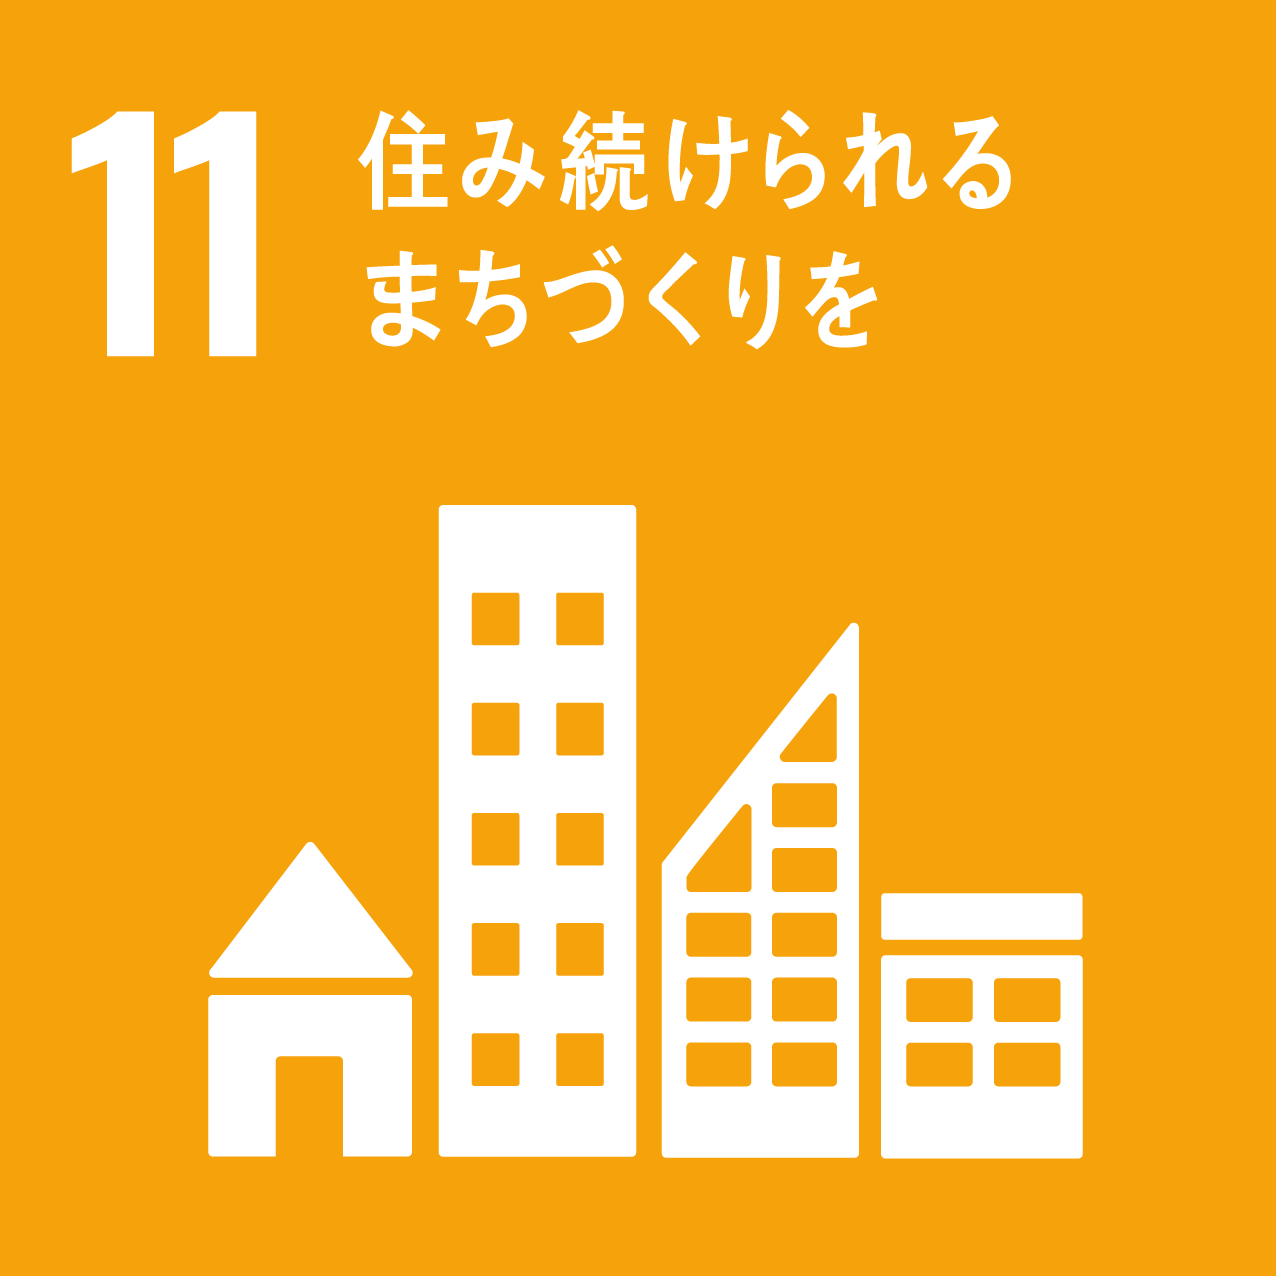 sdg_icon_11_ja_2 | 河田フェザー株式会社